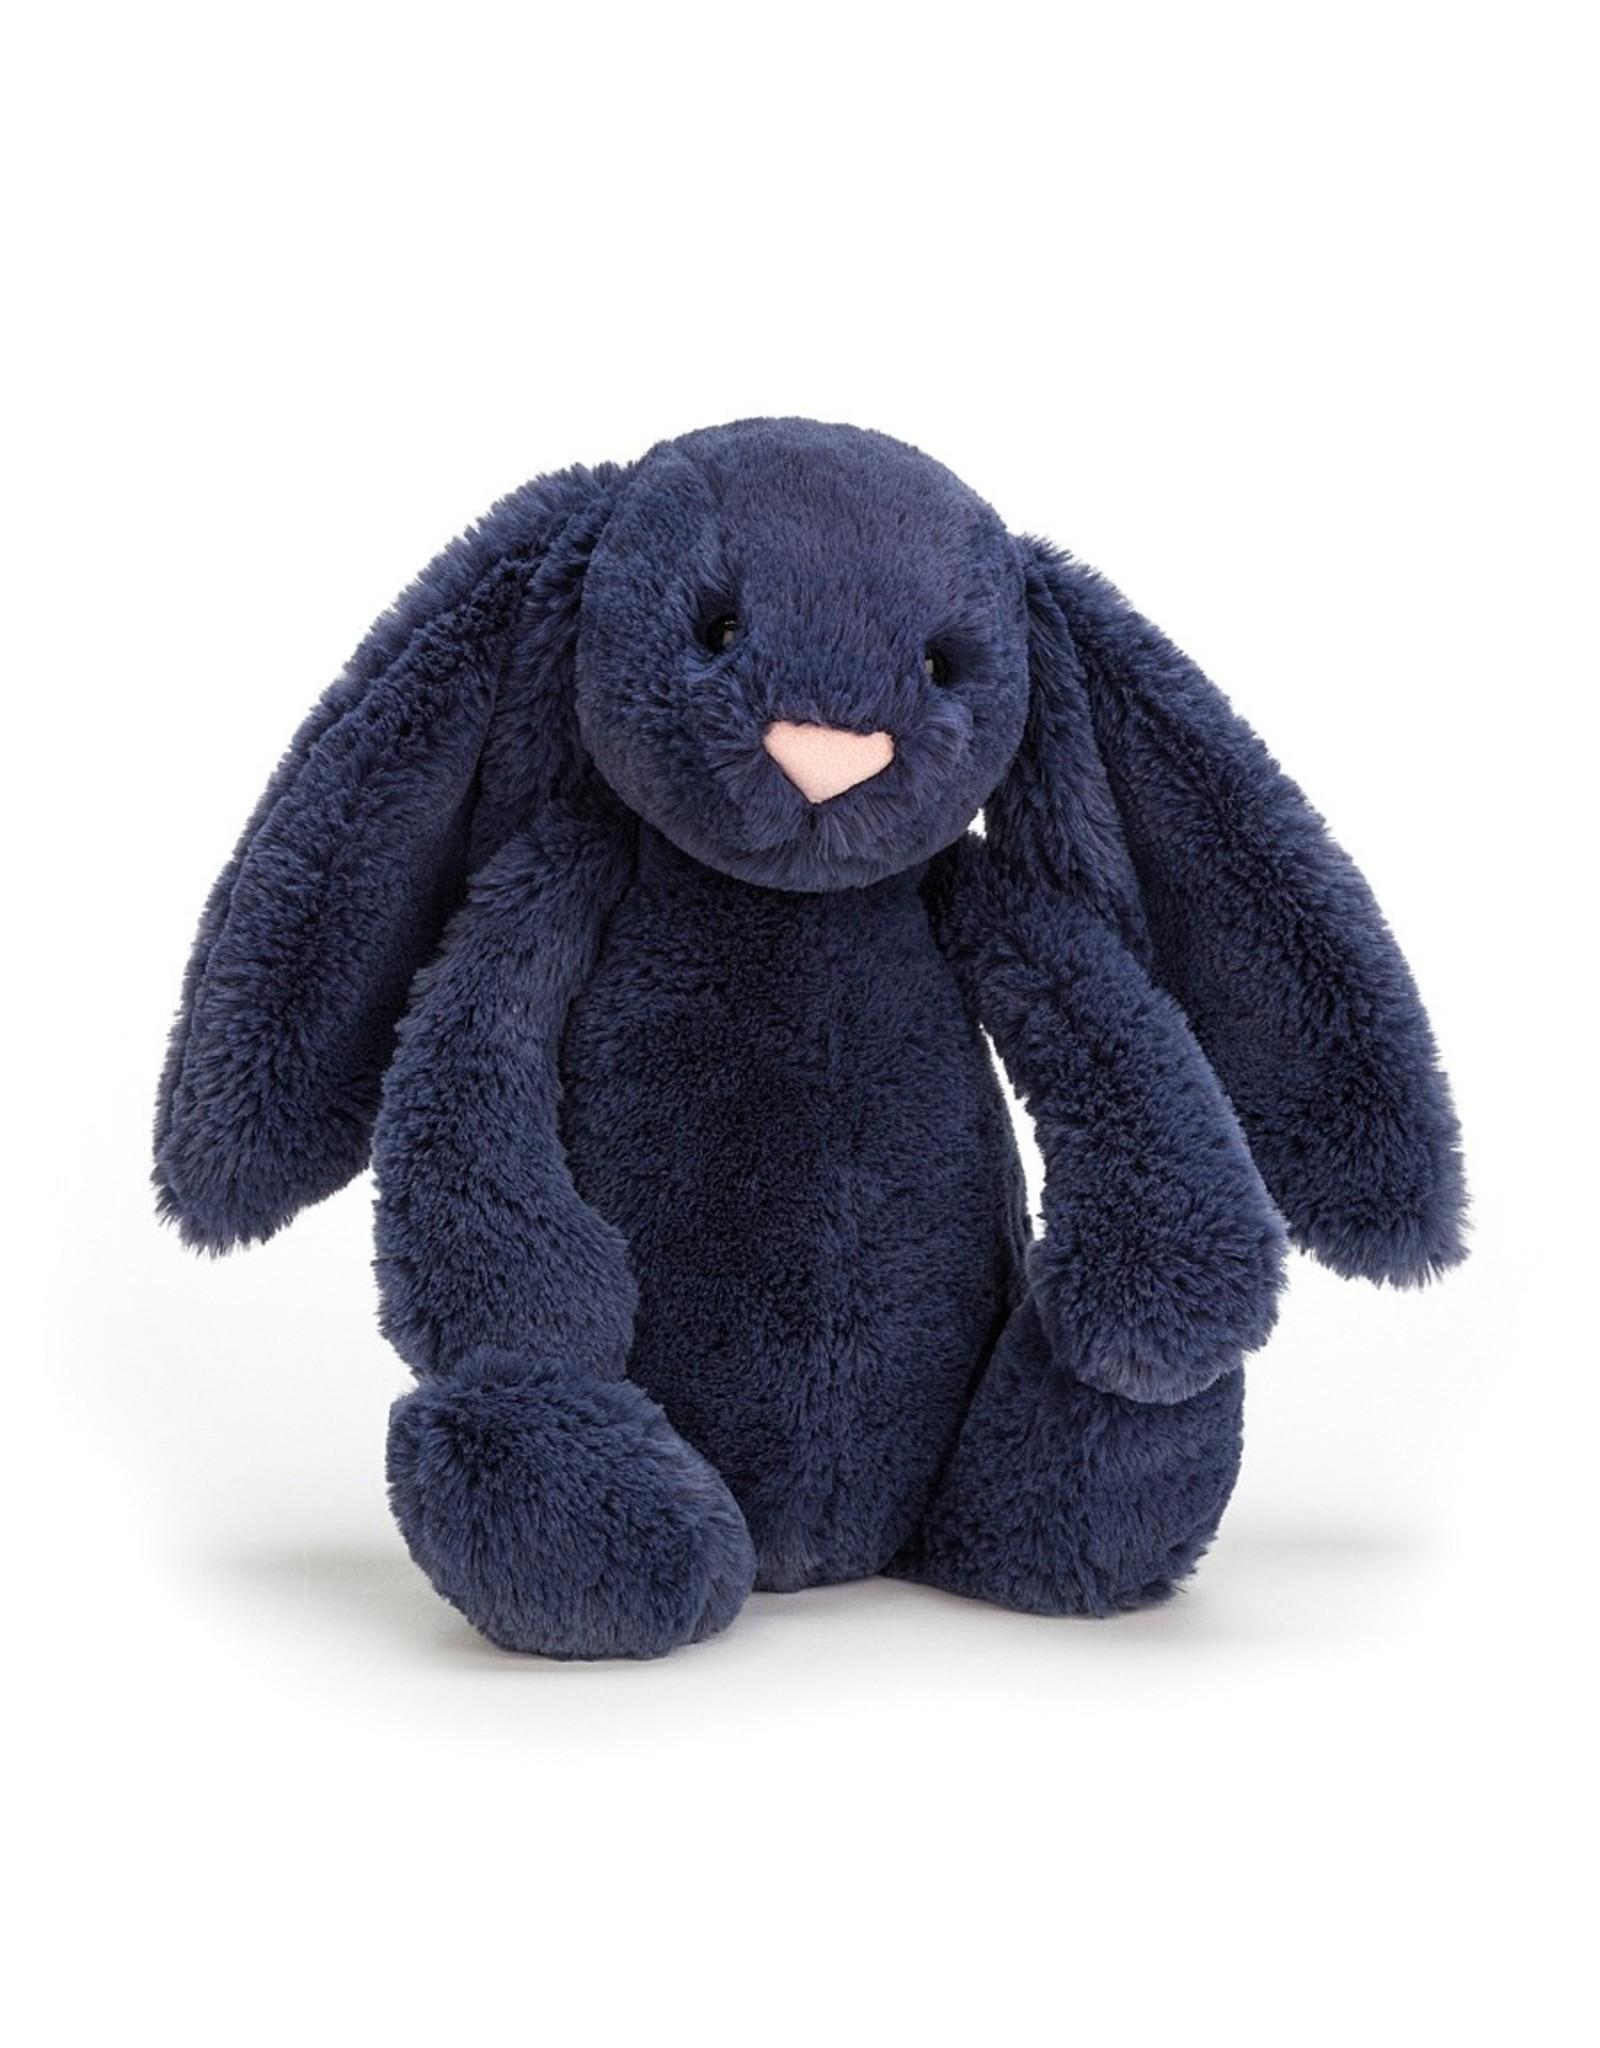 Jellycat Bashful bunny Navy - Medium